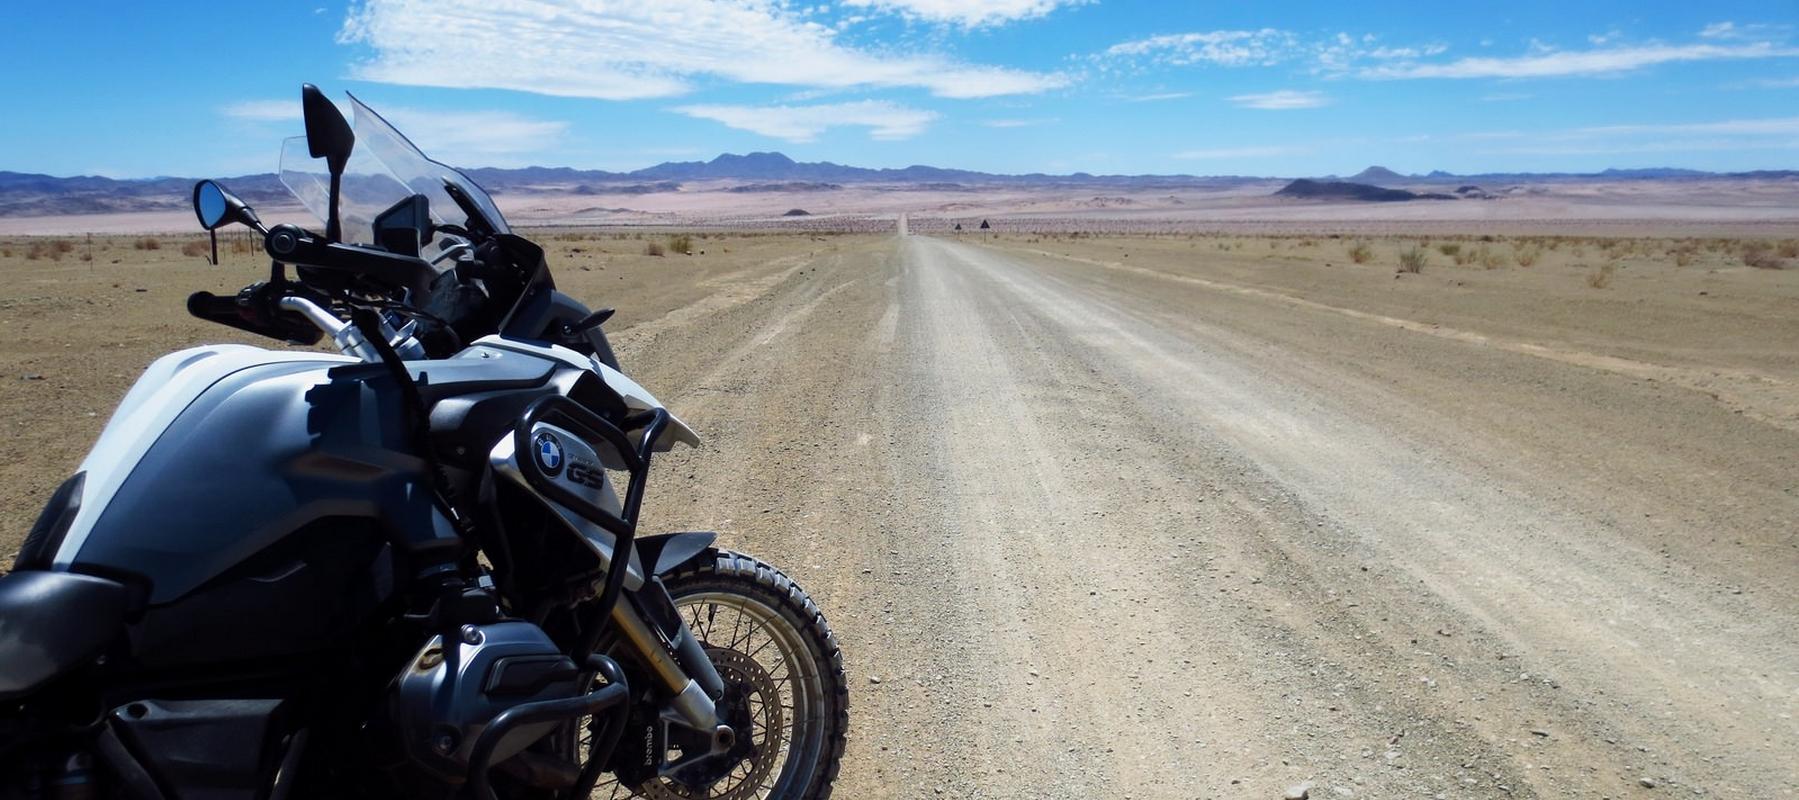 voyage en namibie a moto en bmw gs west euro bikes. Black Bedroom Furniture Sets. Home Design Ideas